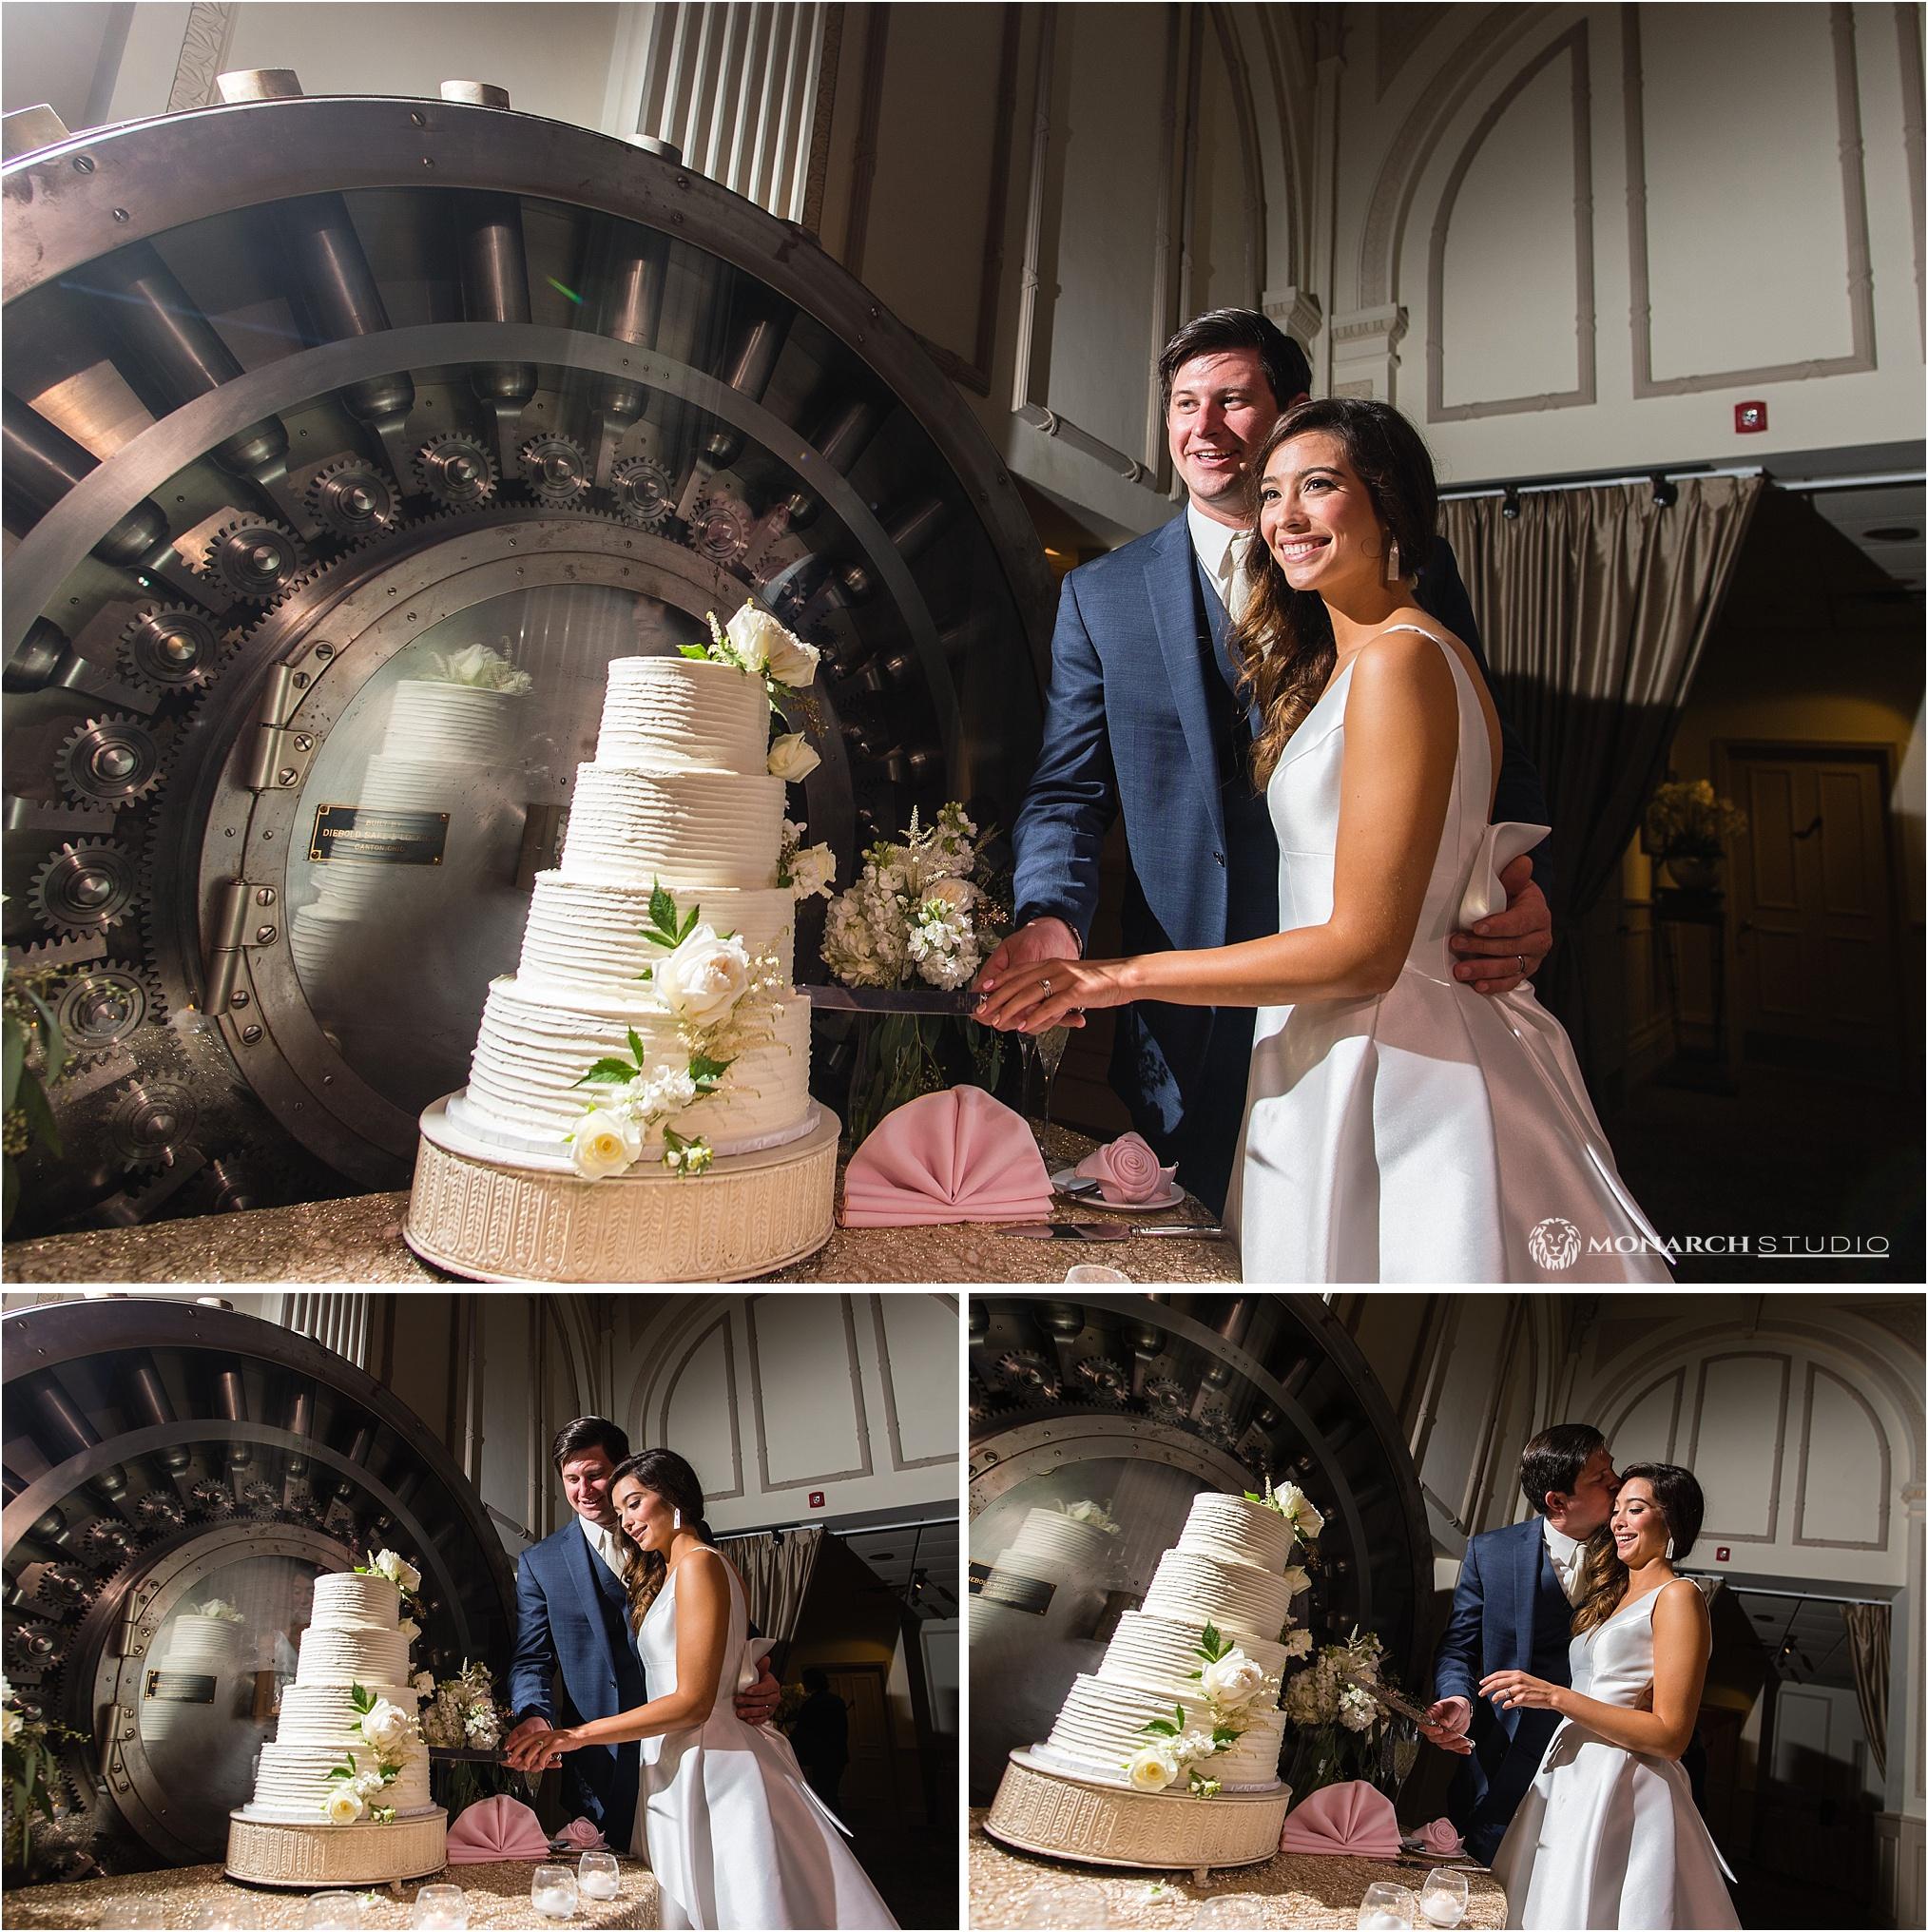 st-augustine-wedding-photographer-124.jpg